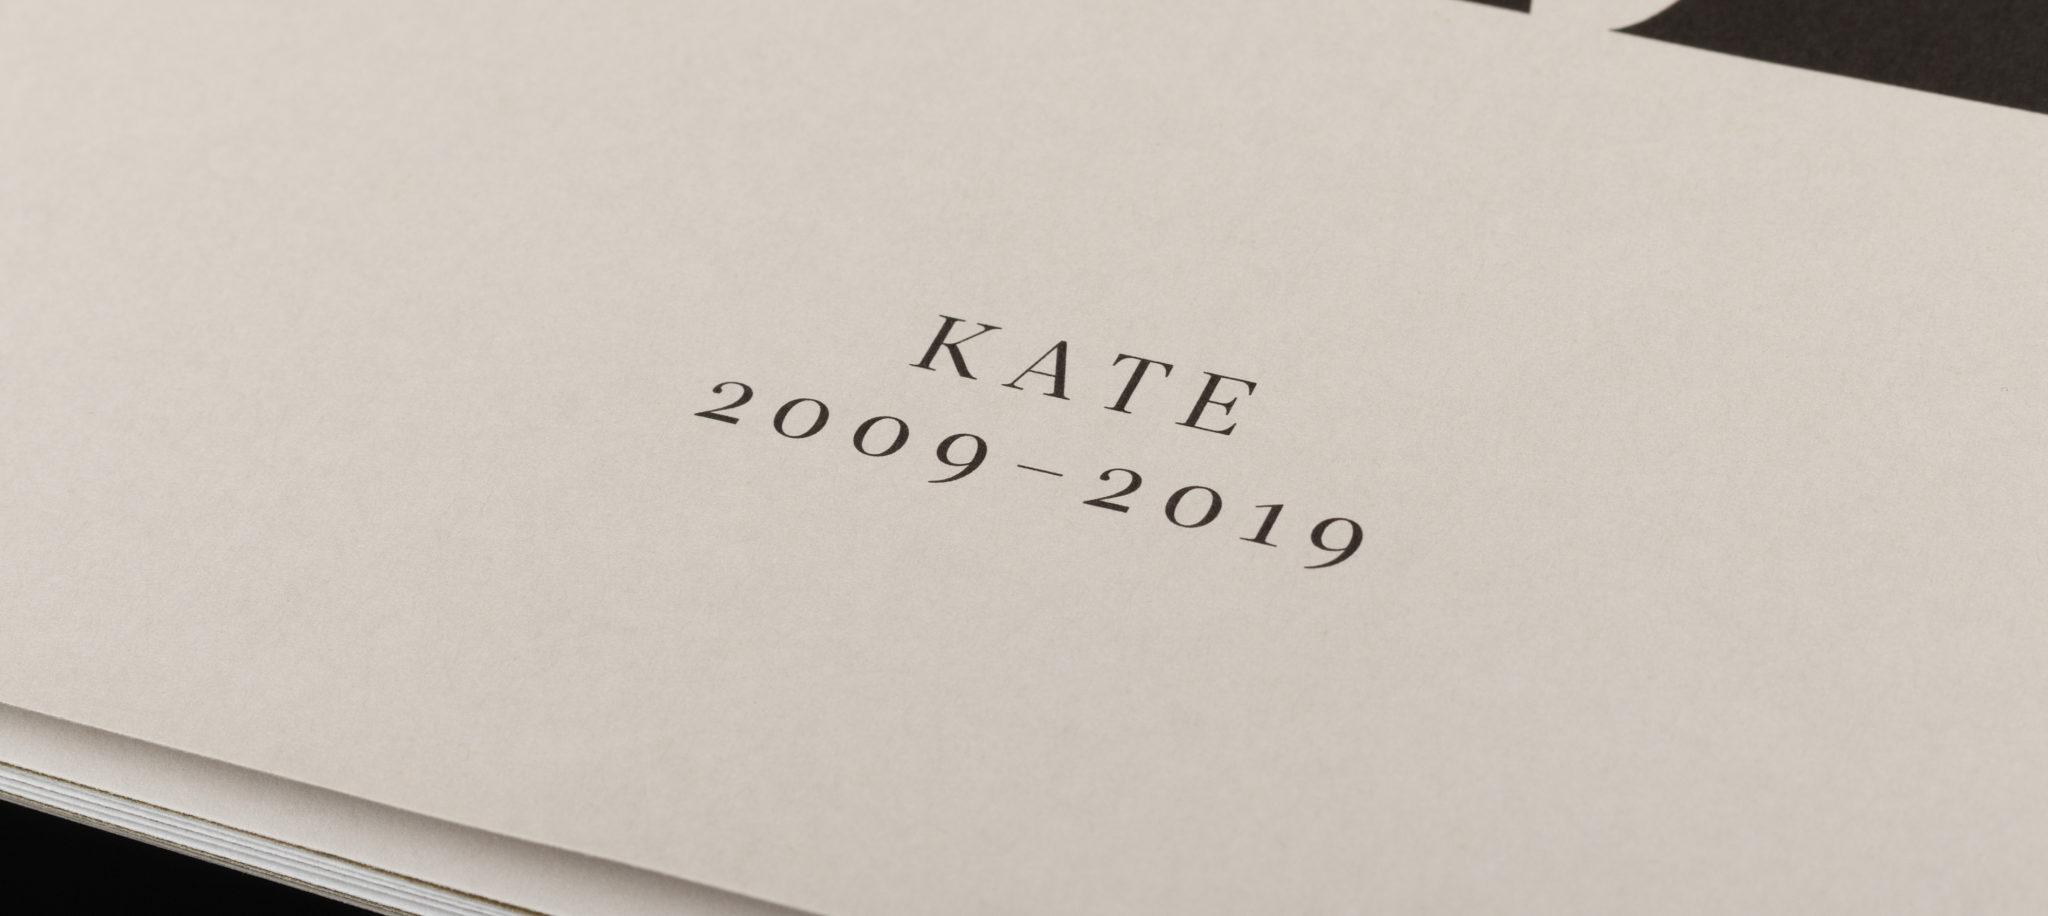 Kate jubileum, tidning. 10 år.